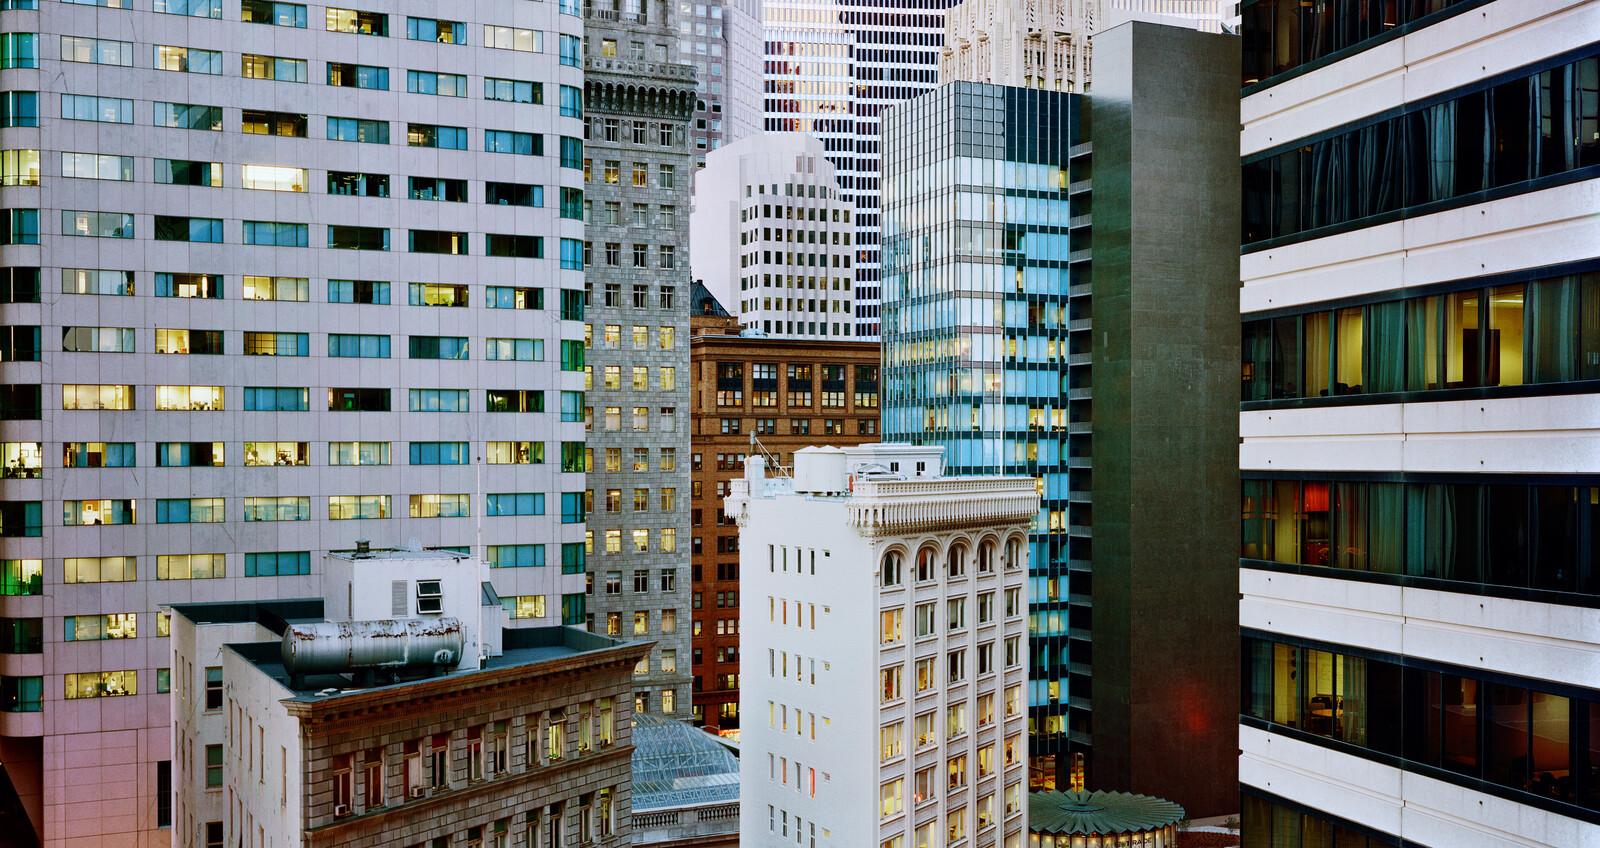 Market Street & 2nd Street, San Francisco - Christopher Woodcock